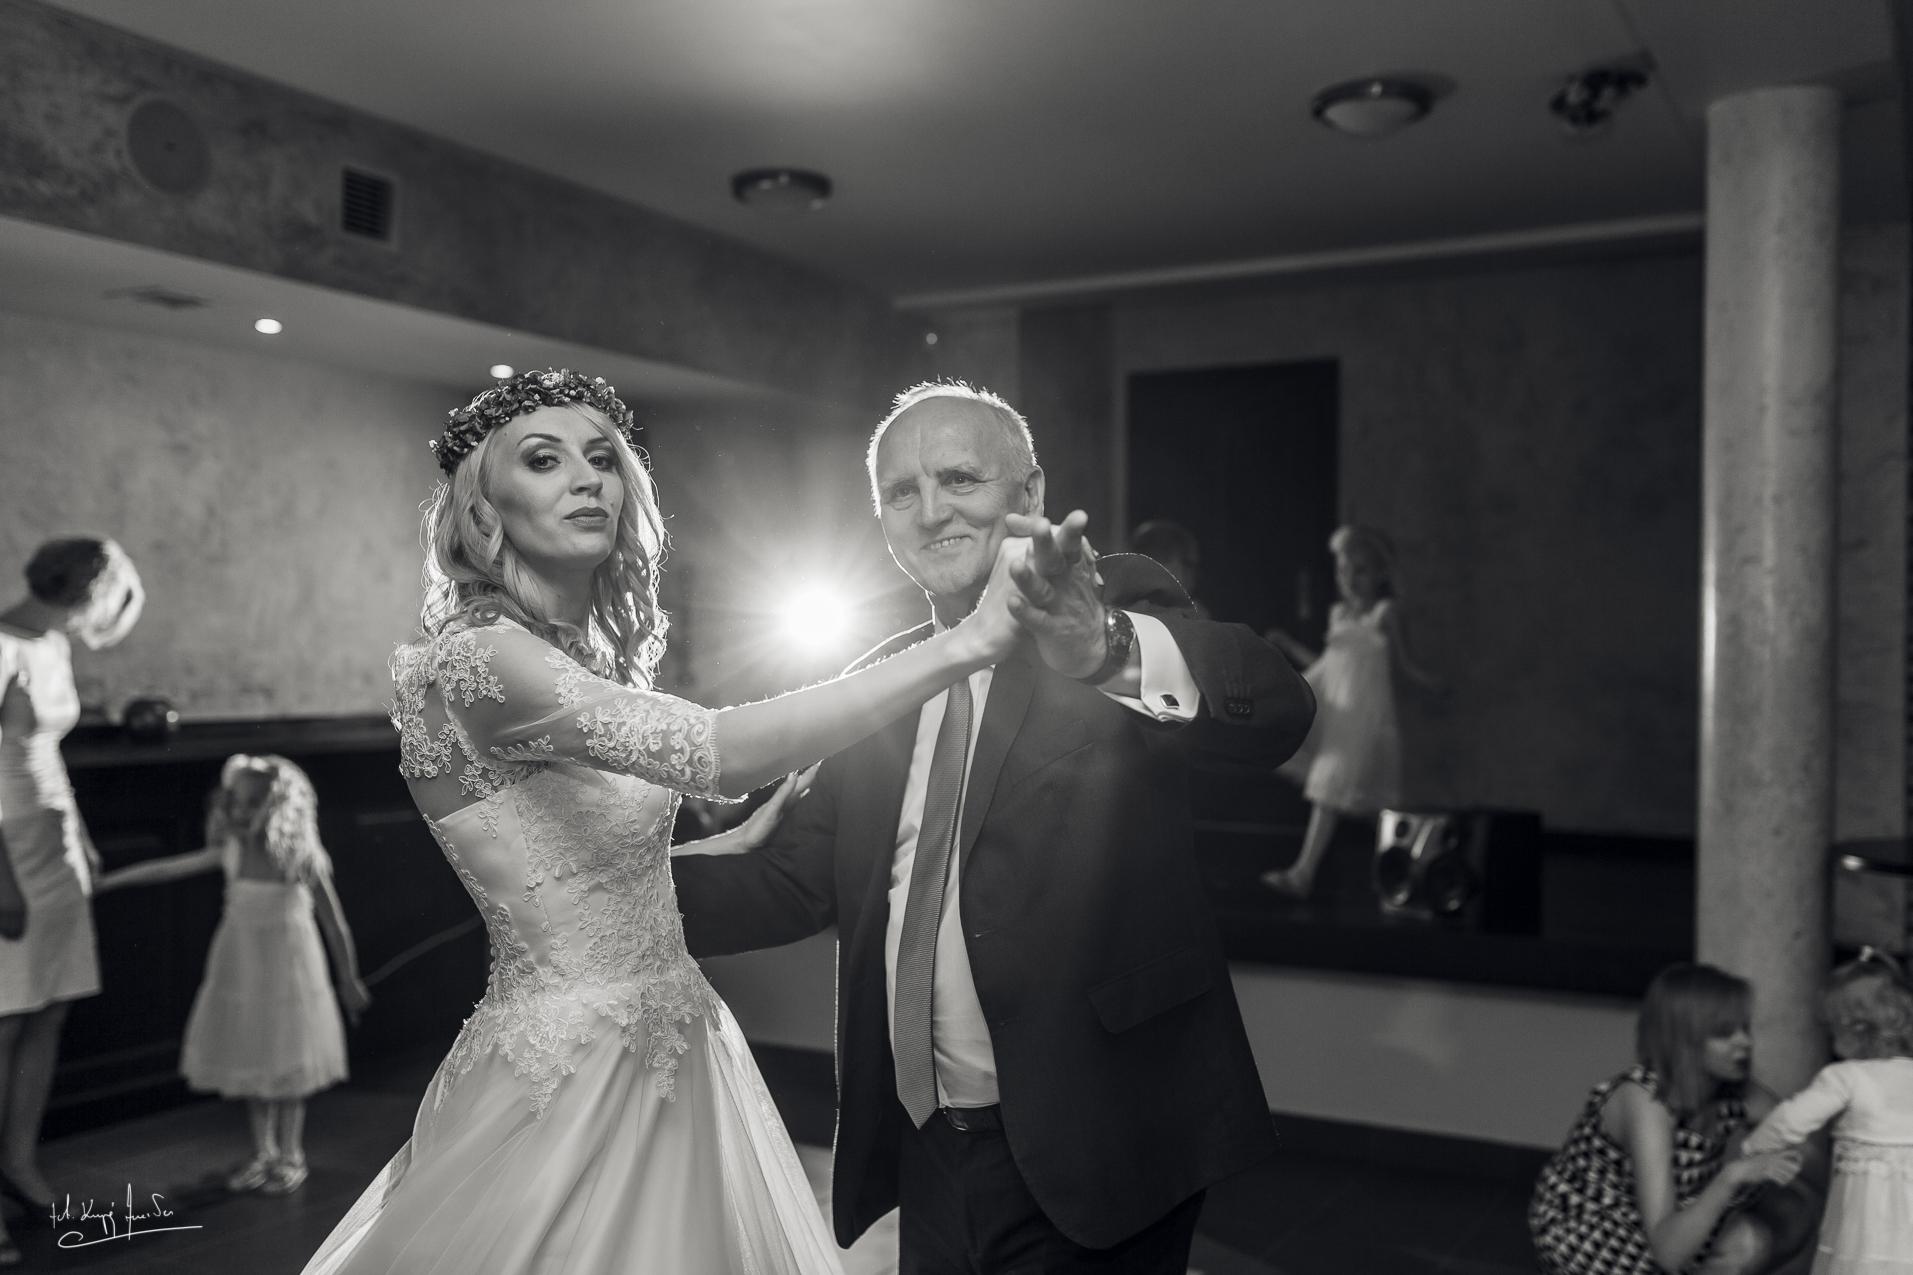 Ślub wesele szklarska poręba 36 Marta & Sławek